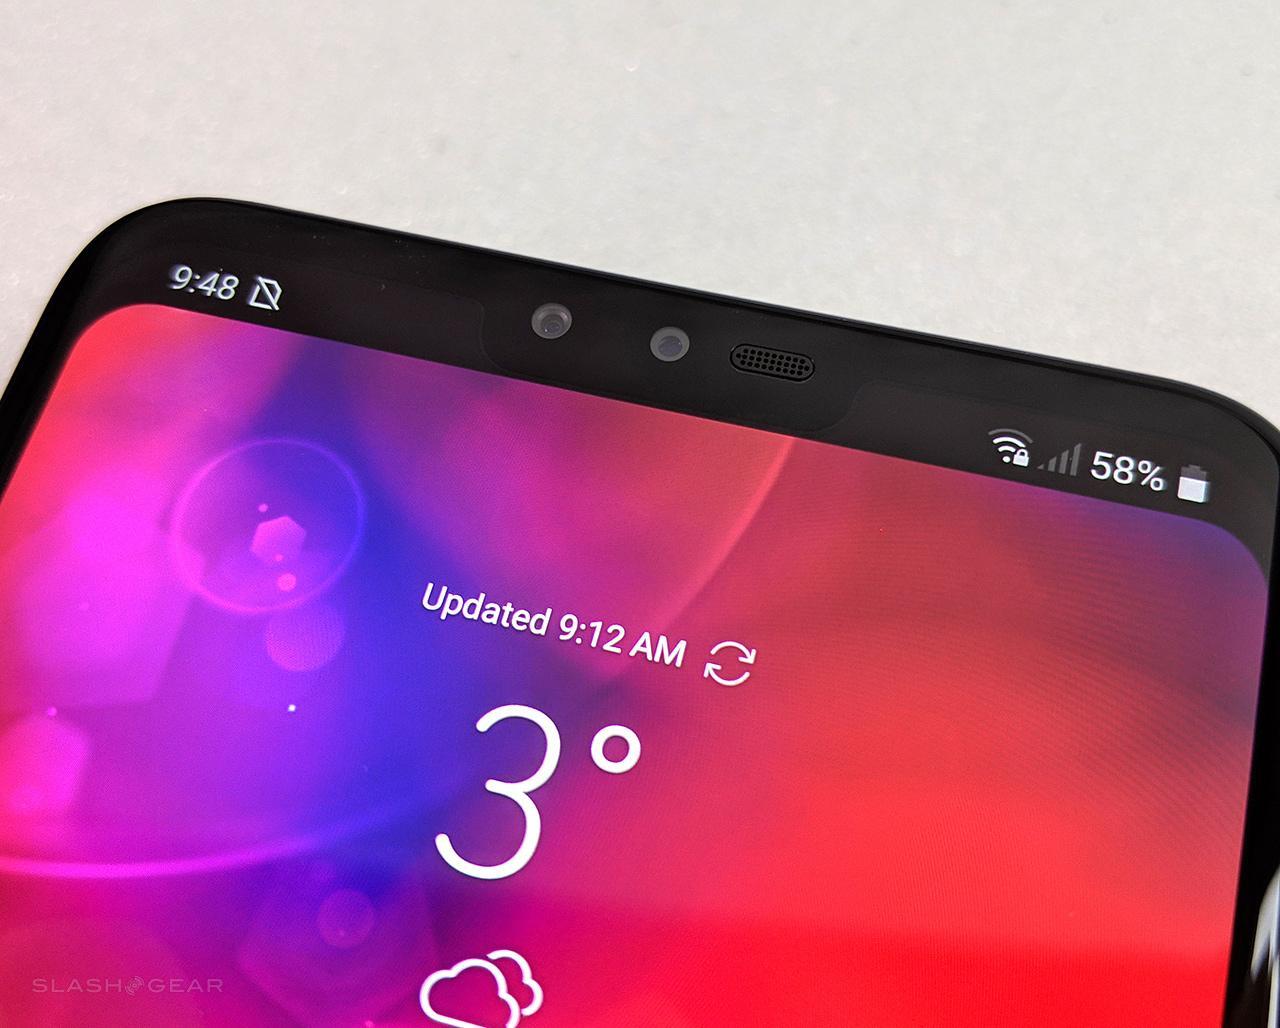 LG V40 ThinQ Review: Unique in colorful quality - SlashGear